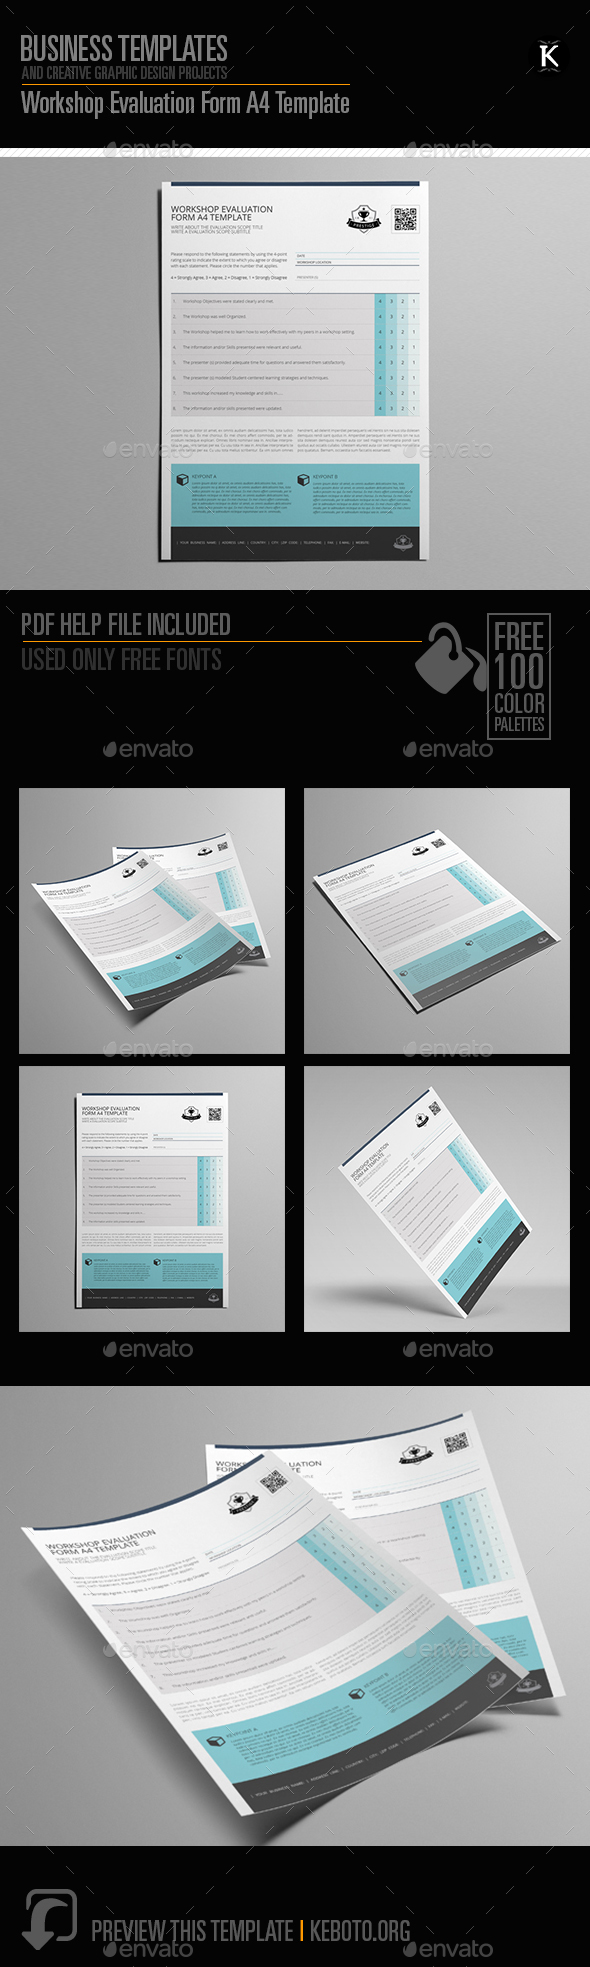 GraphicRiver Workshop Evaluation Form A4 Template 20655013